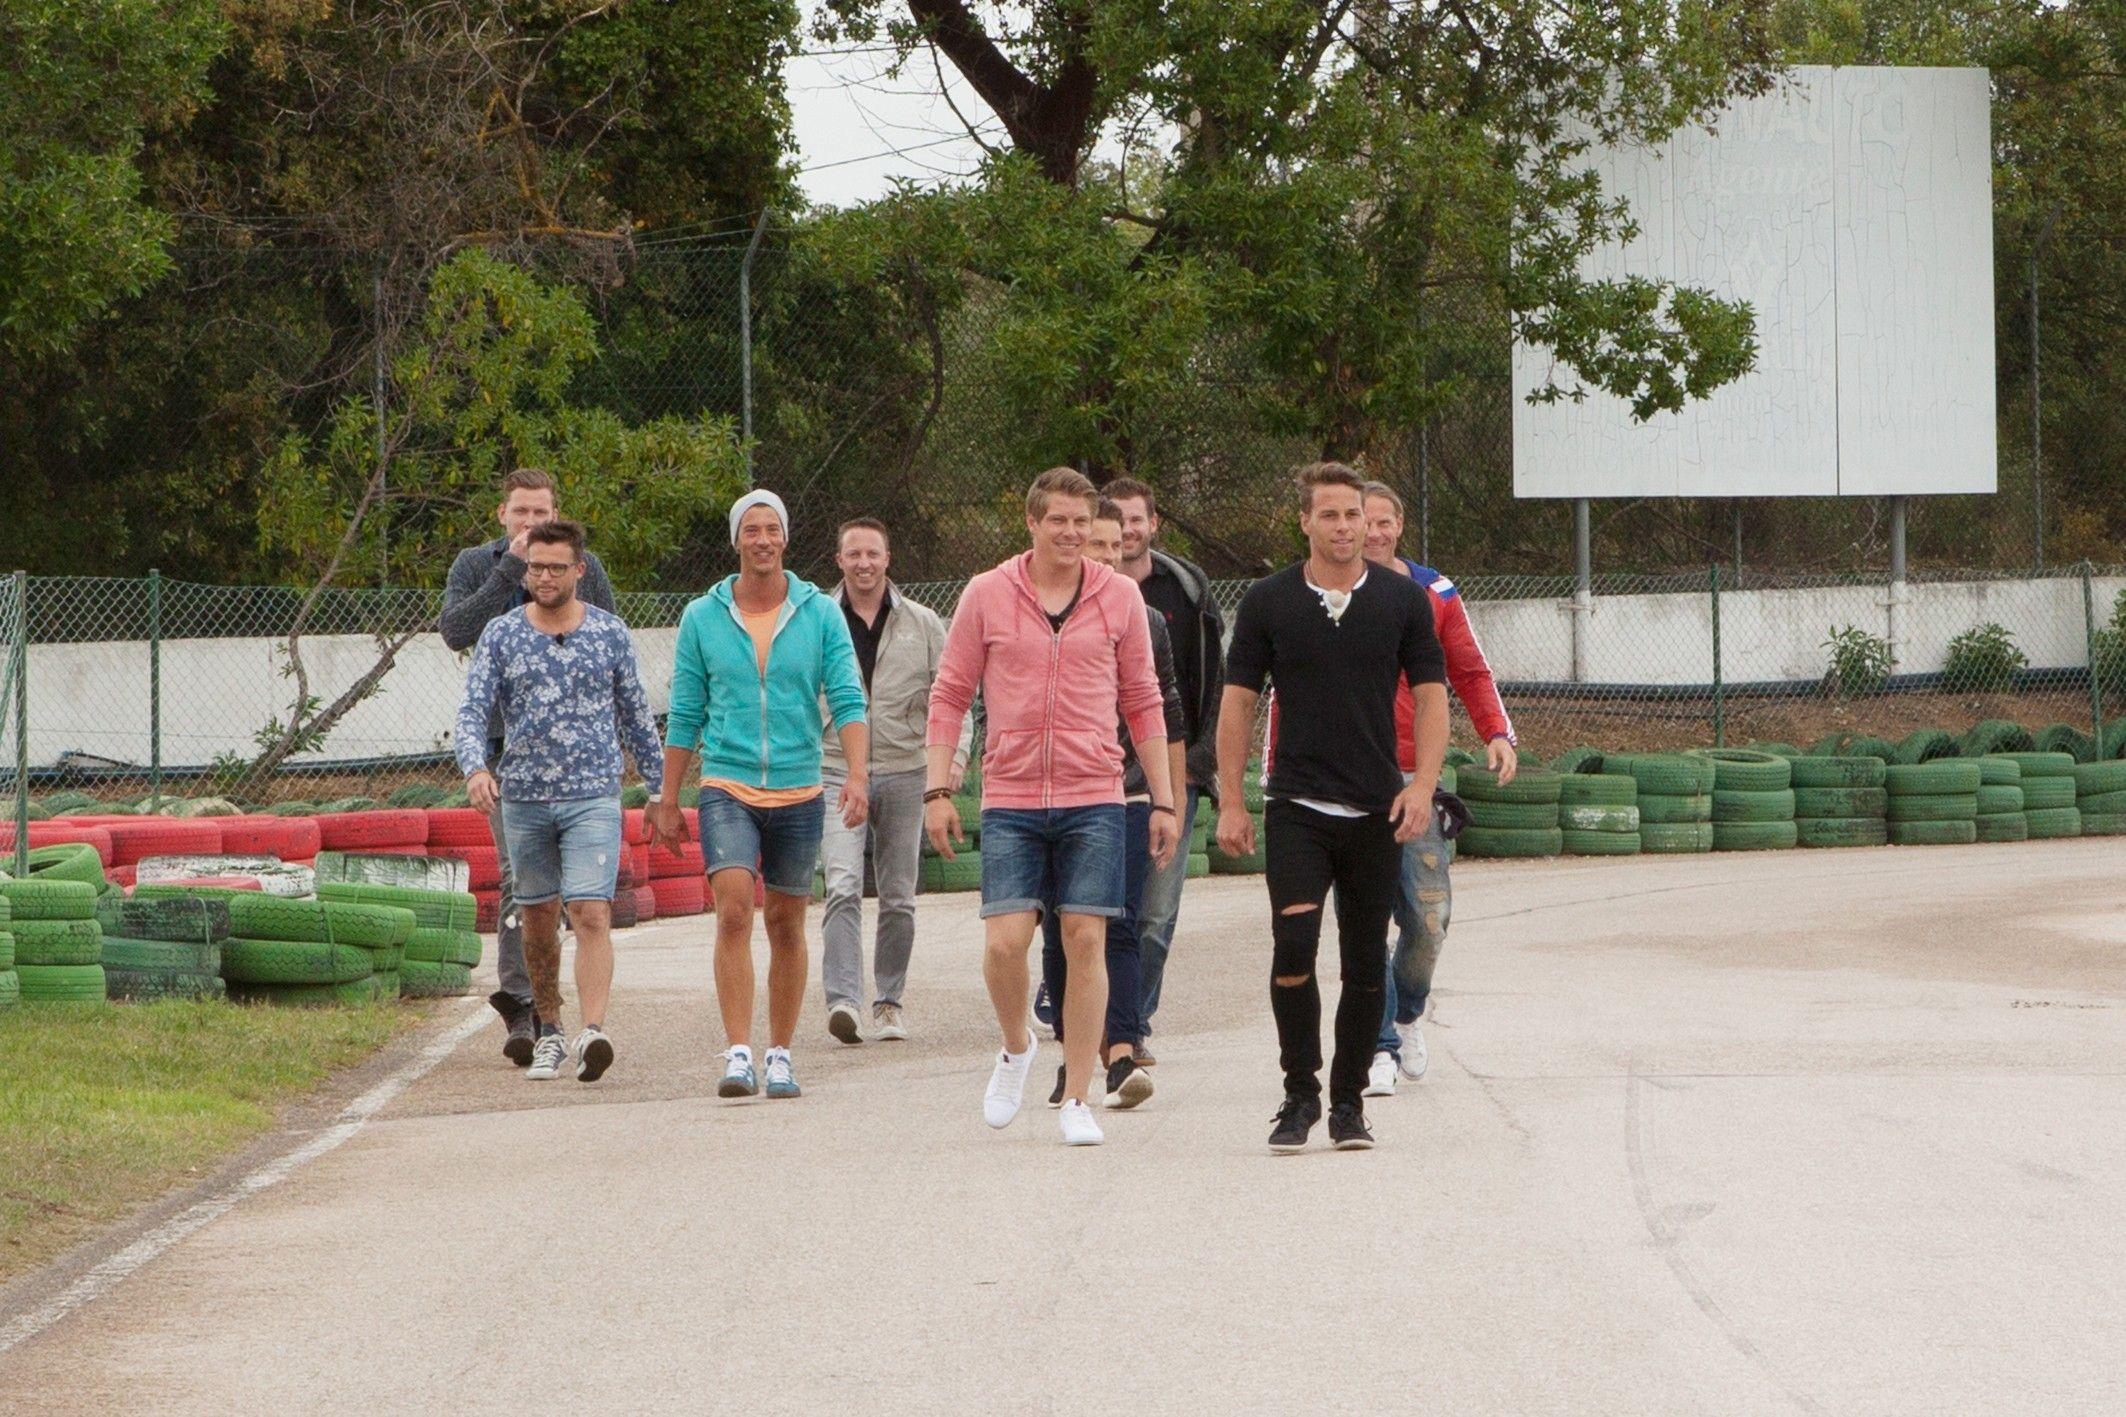 Die Bachelorette 2015 Folge 3 - 10 Jungs beim Gruppendate